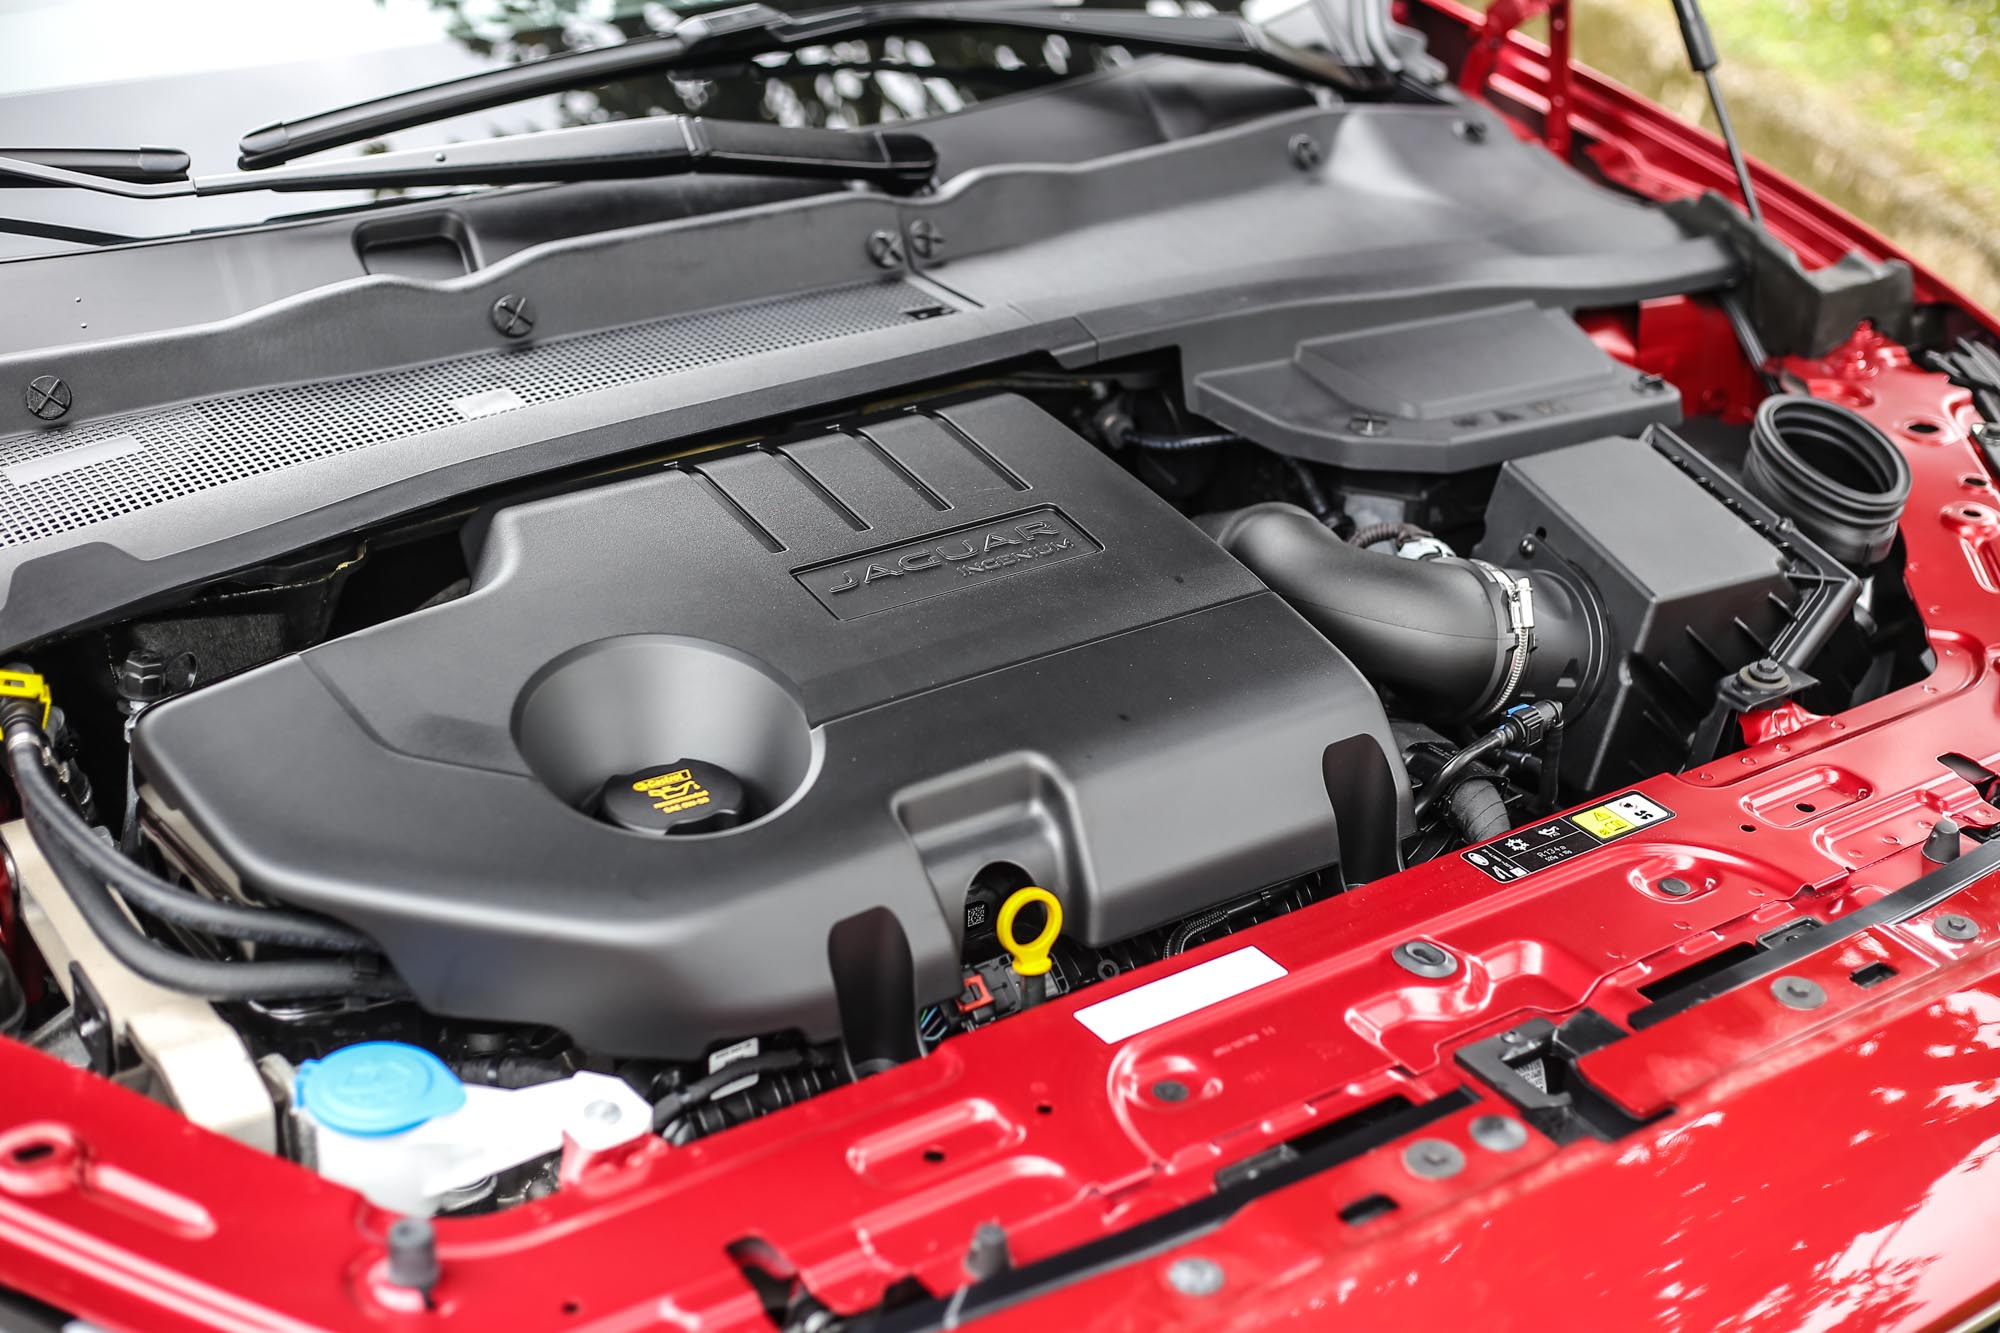 D150車型搭載2.0升柴油引擎,具備150ps/3500rpm最大馬力與380kgm/1750rpm最大扭力輸出。